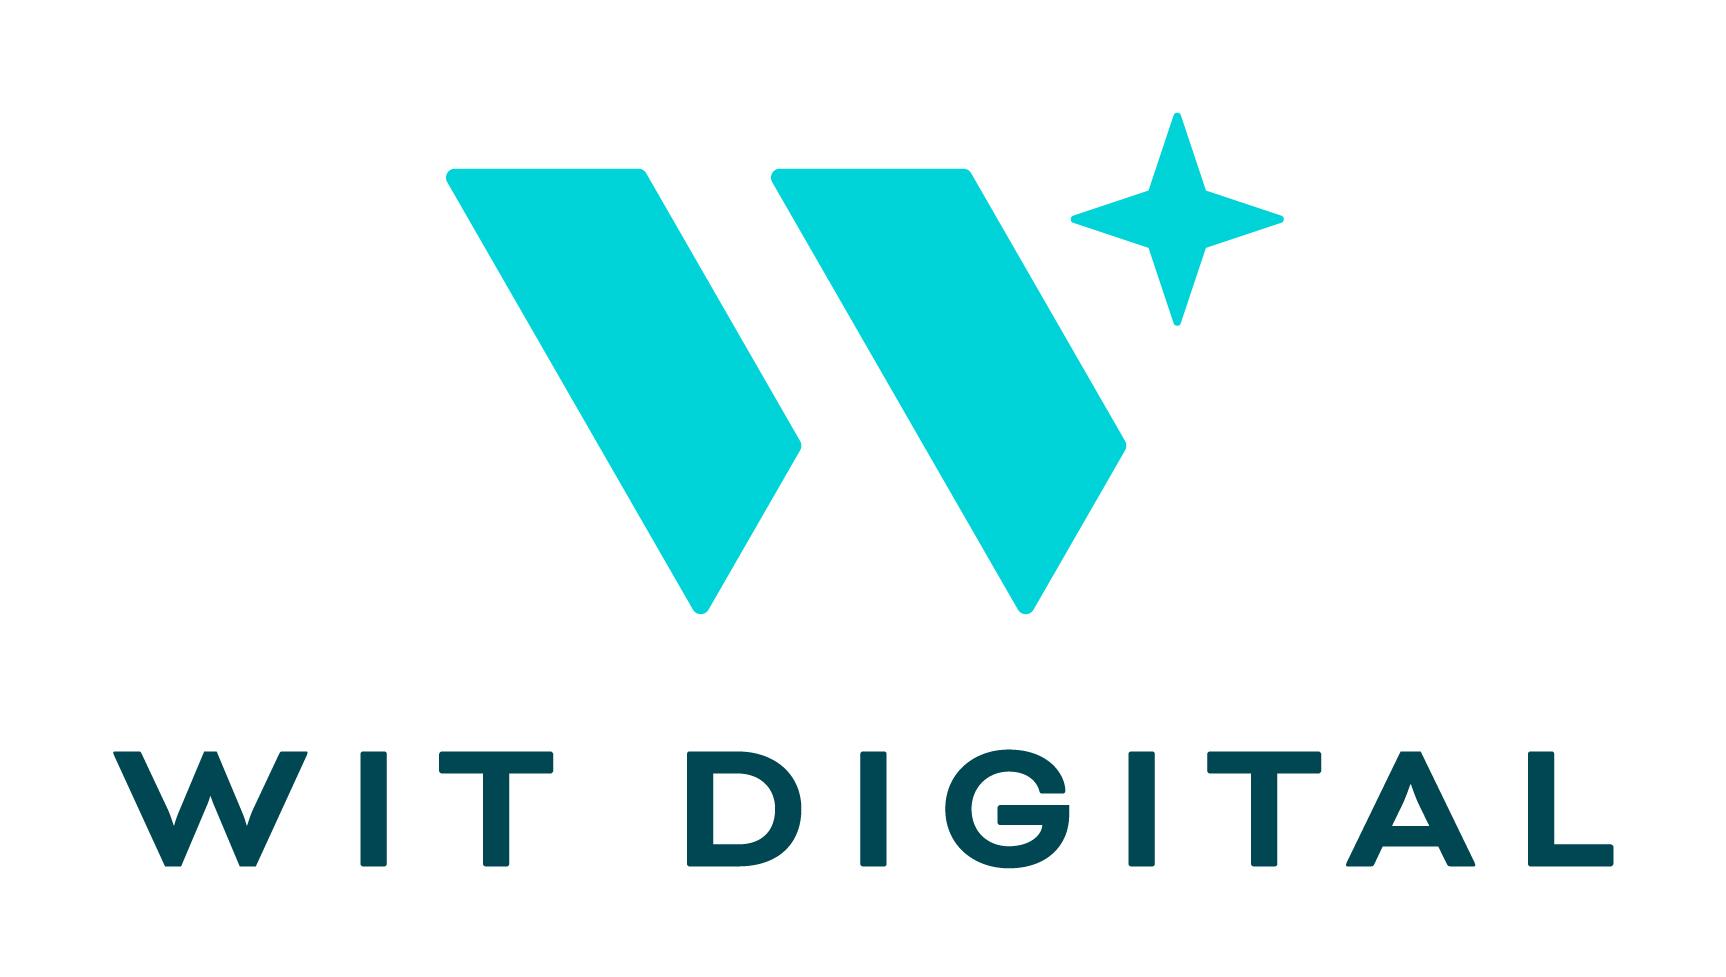 Wit Digital Primary logo